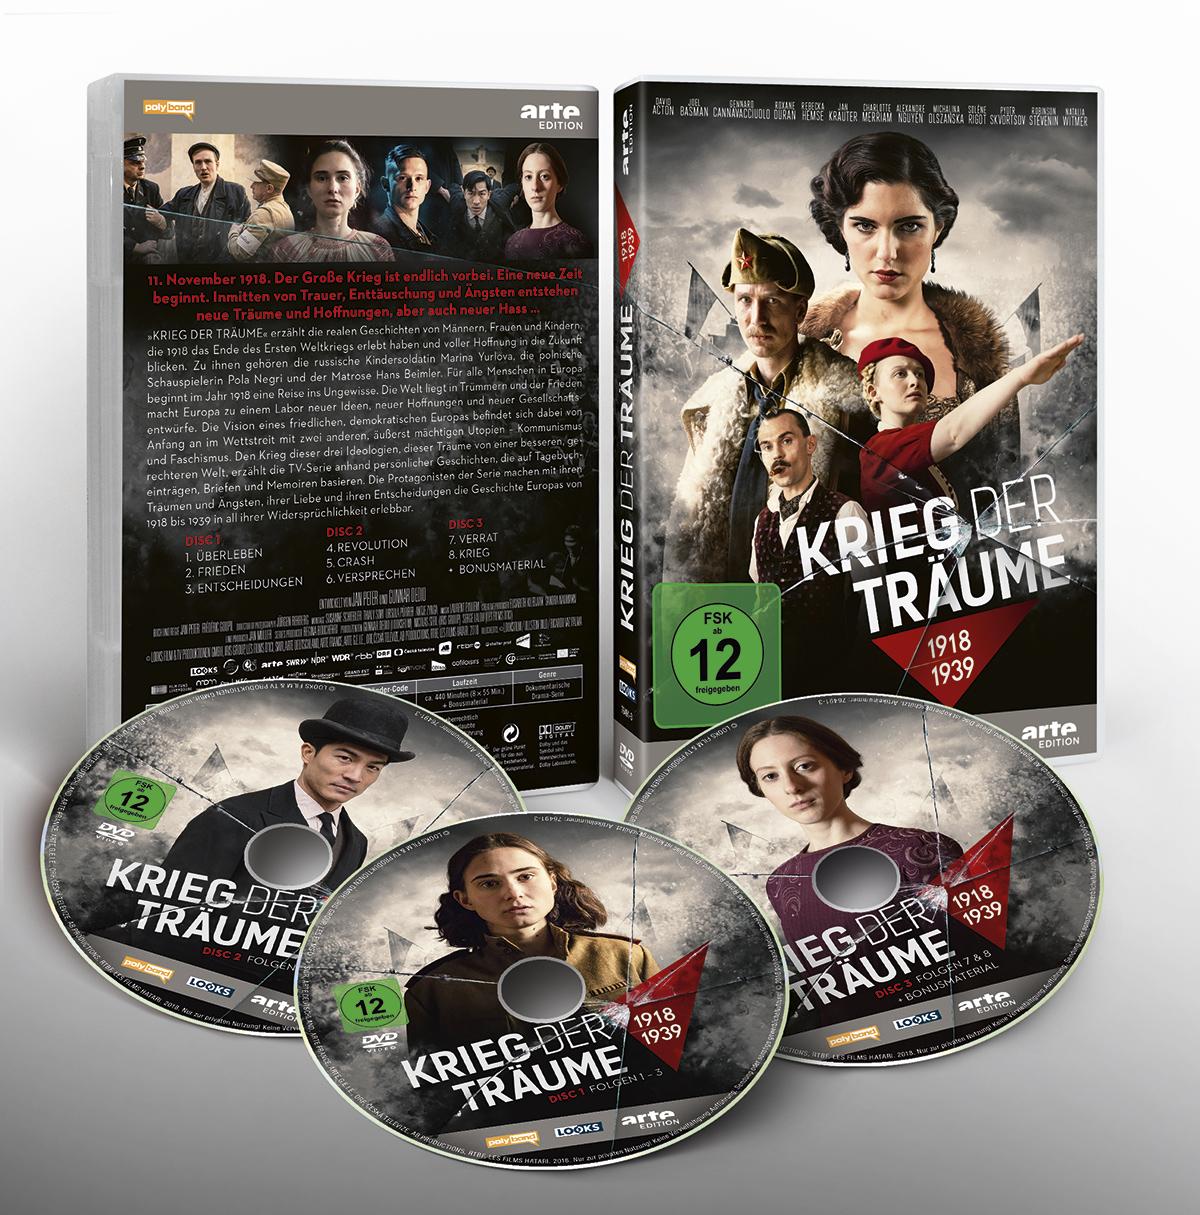 Krieg der Träume Clash Of Futures Looks Film TV Serie Dramaserie Gestaltung Plakat Keyartwork Arte ARD Affaire Populaire DVD